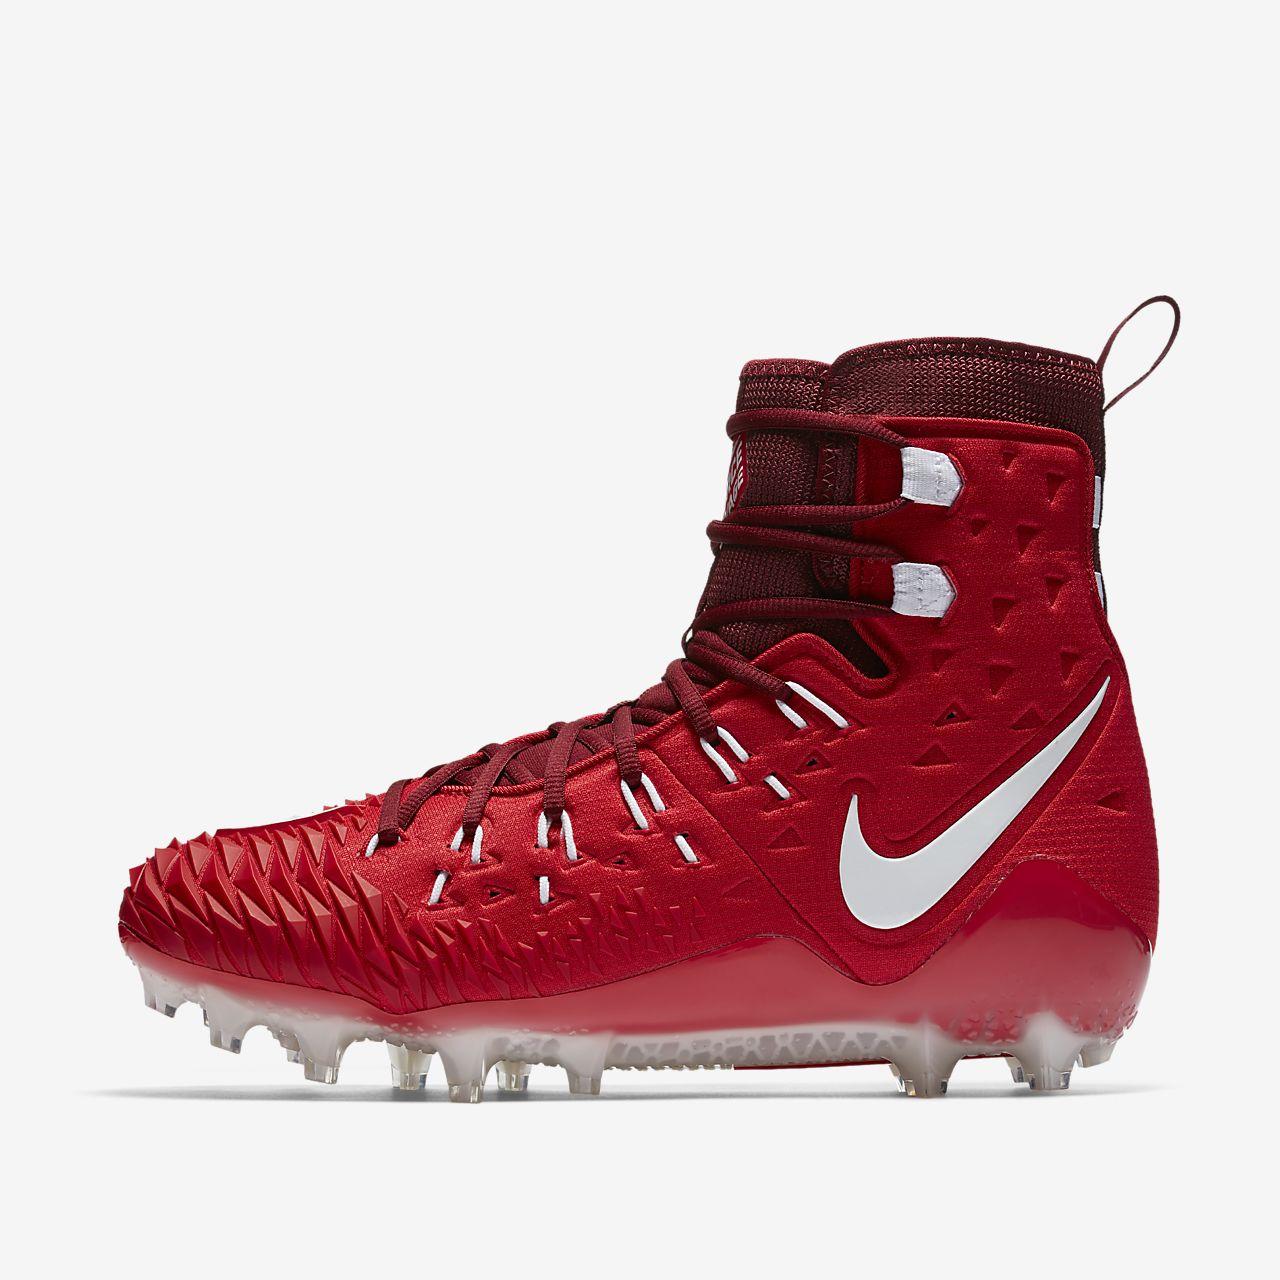 ... Nike Force Savage Elite TD Men's Football Cleat